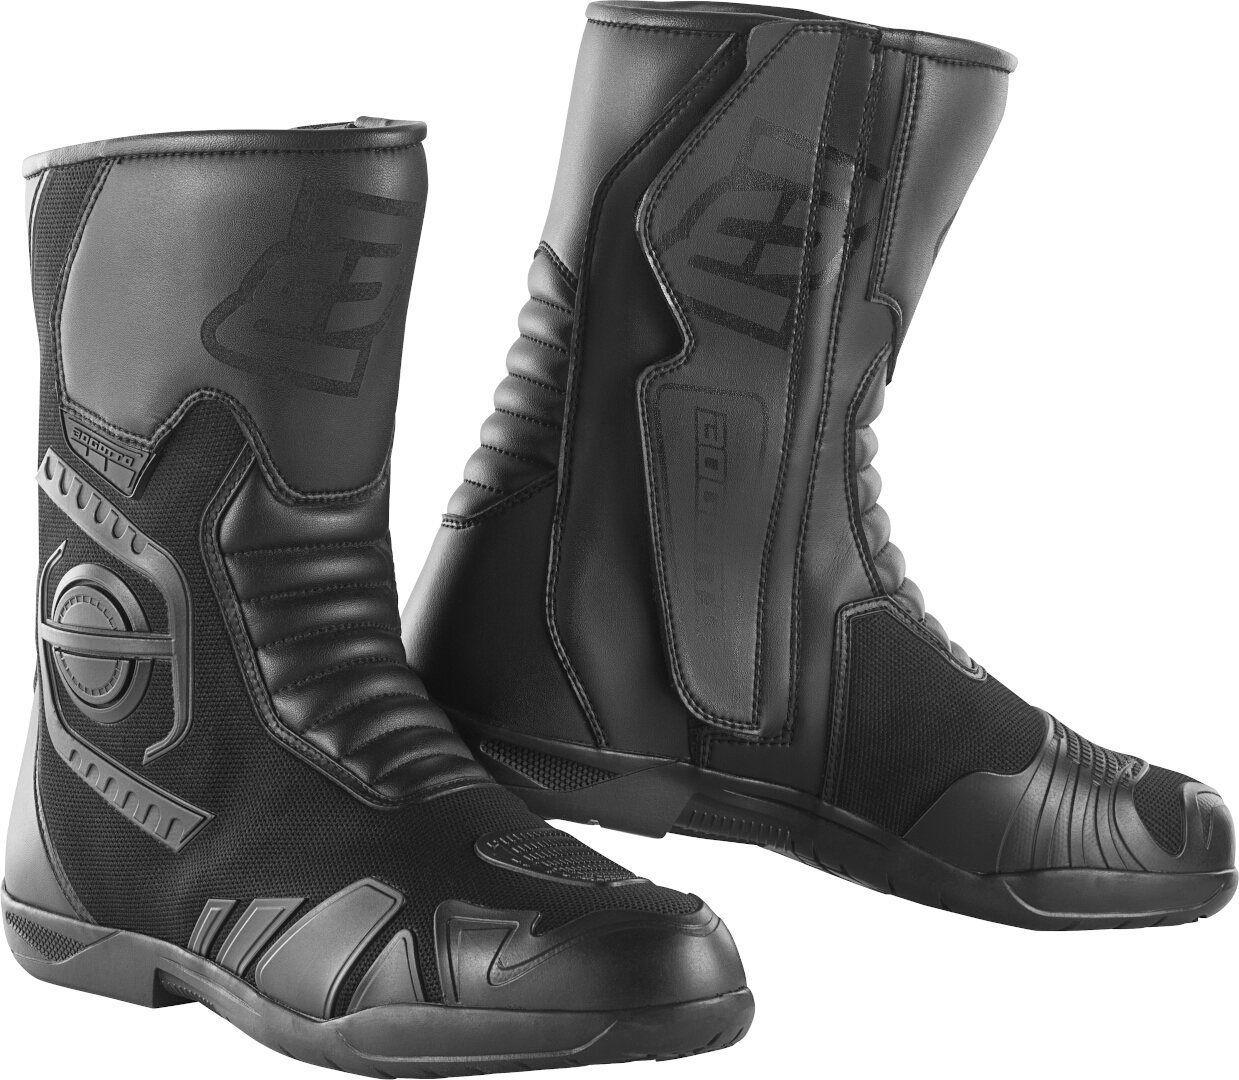 Bogotto Caracas Waterproof Motorcycle Boots Black 48